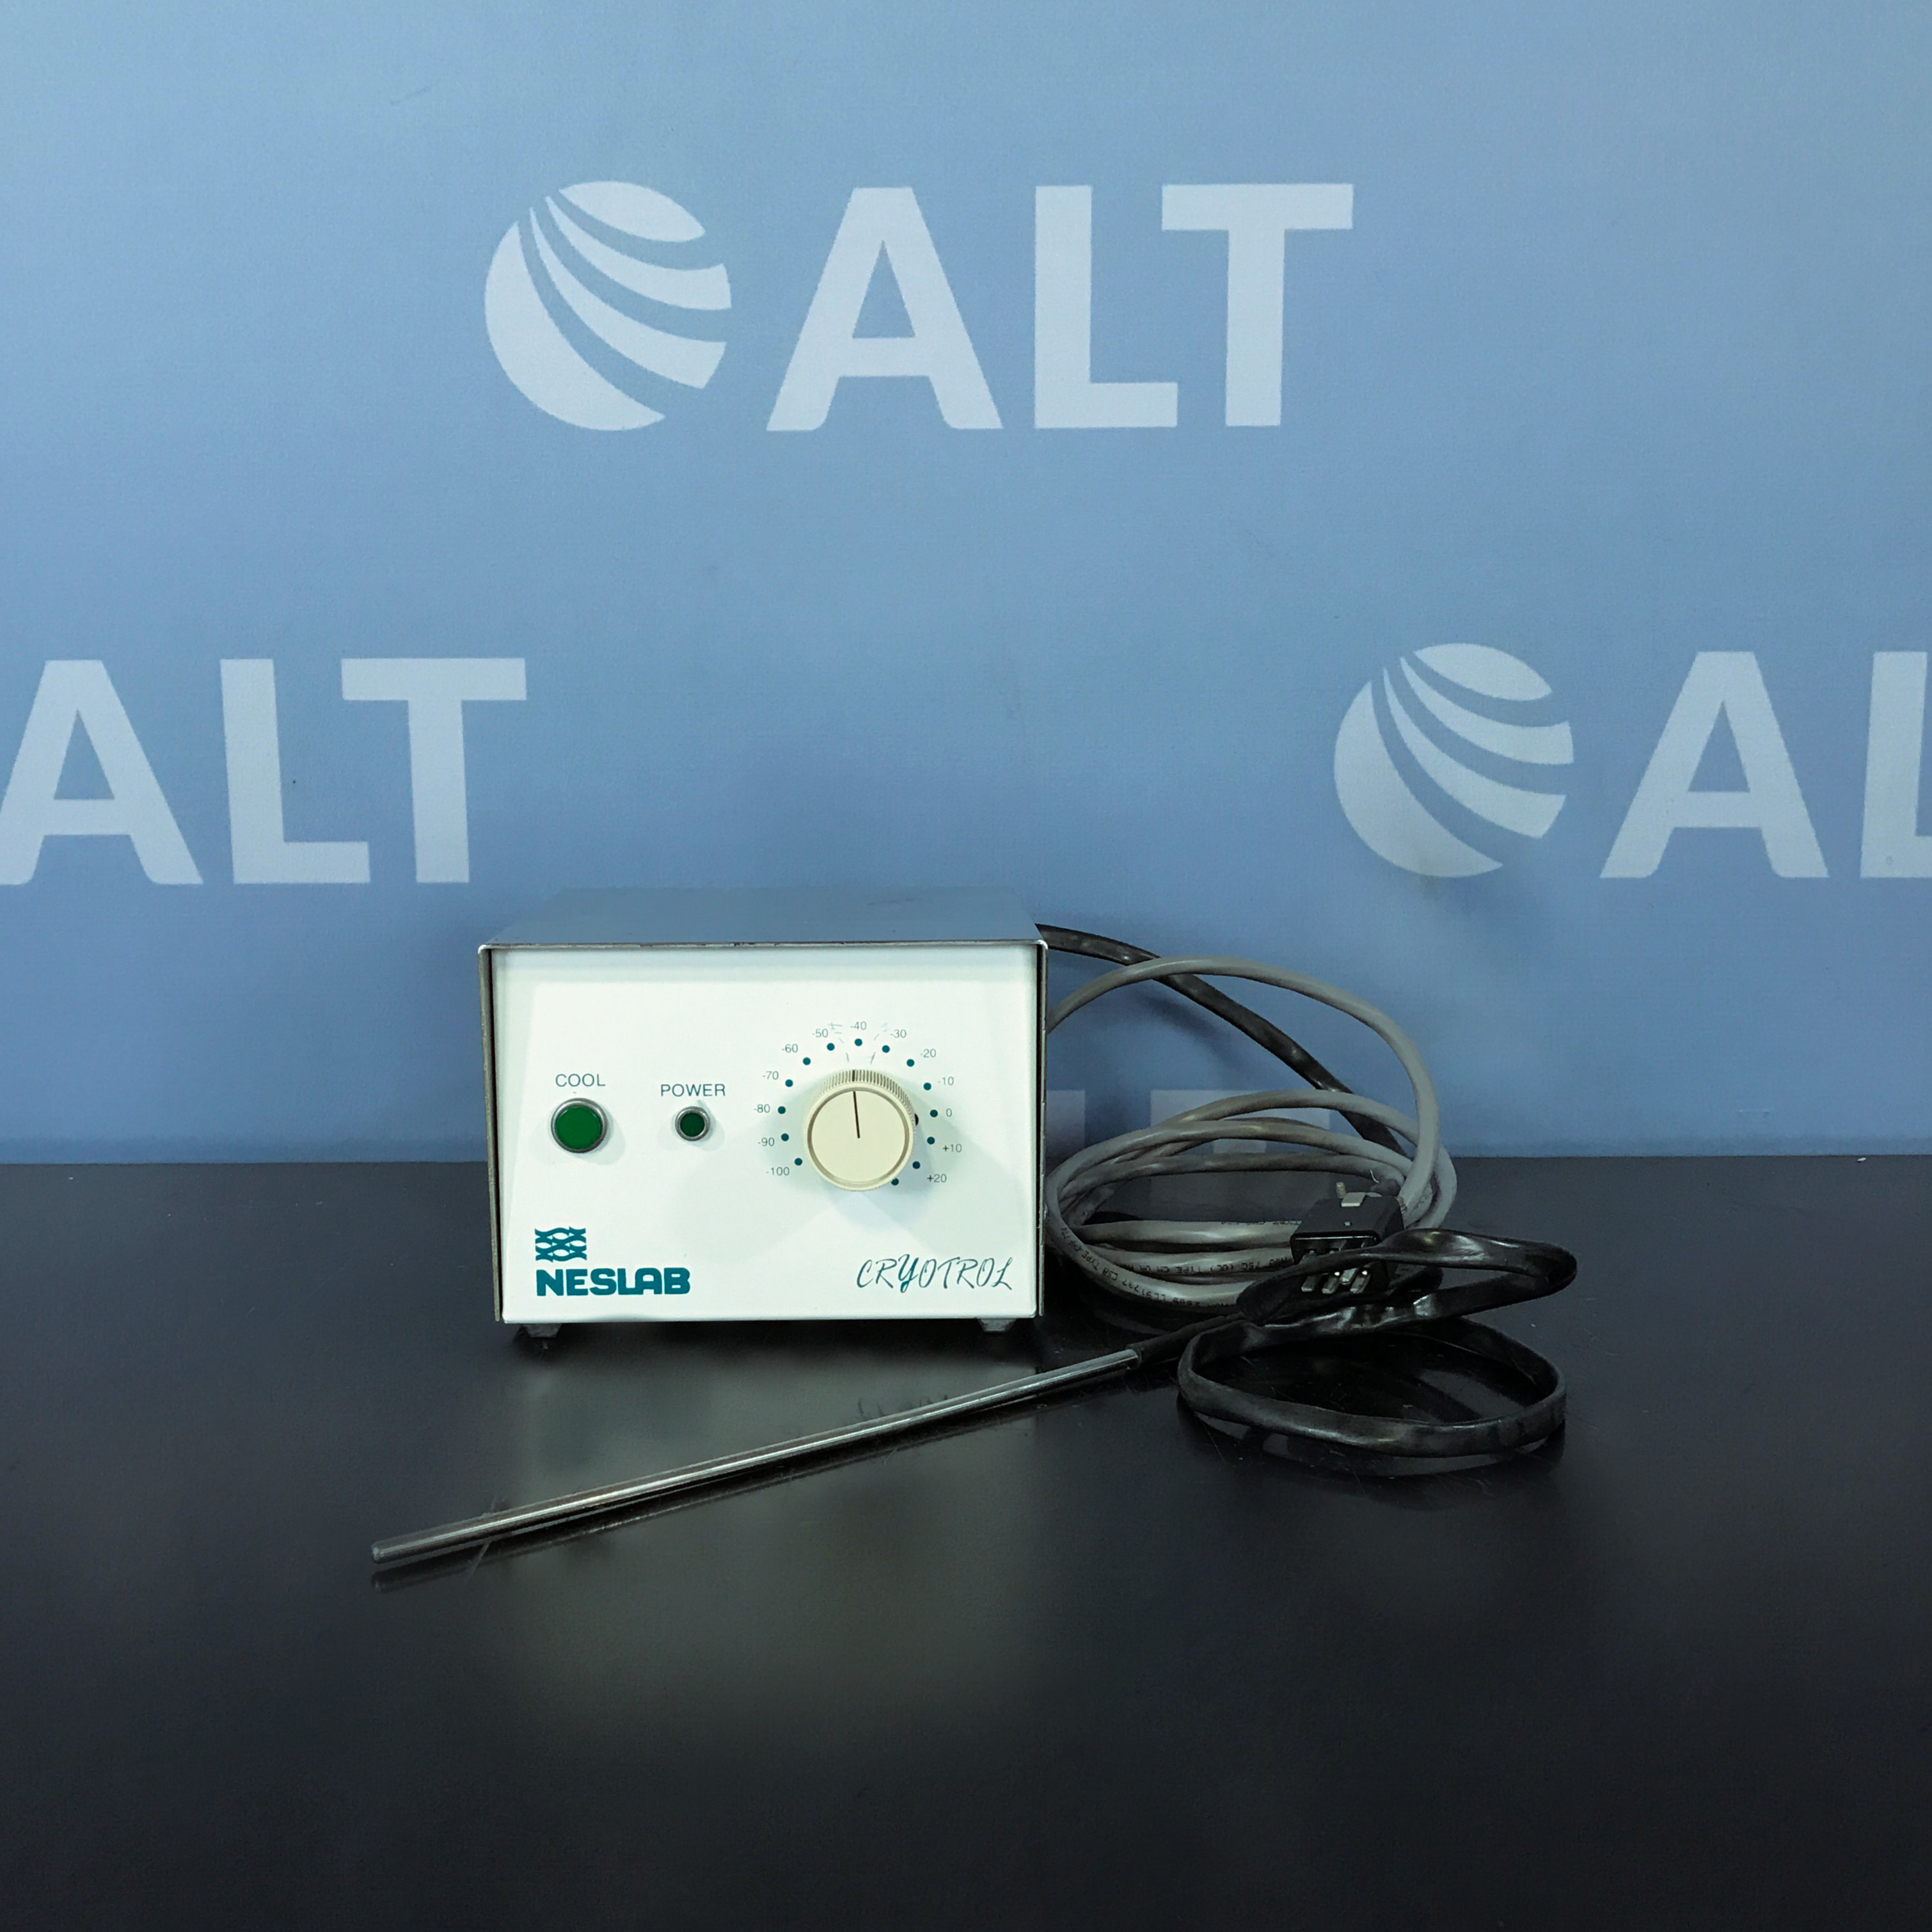 Neslab Cryotrol Temperature Controller Image